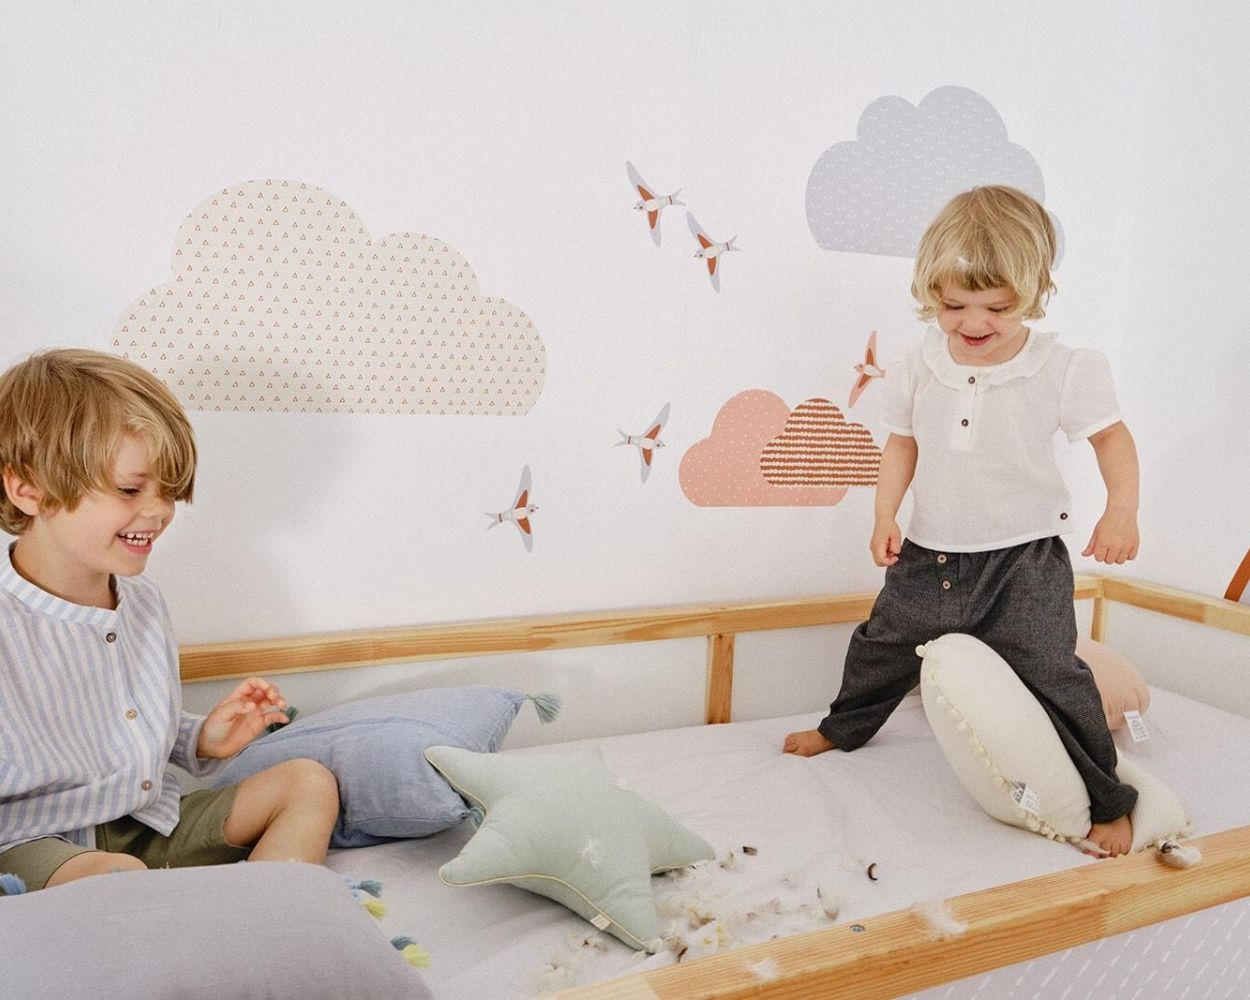 Ikea Kinderbett spielende Kinder